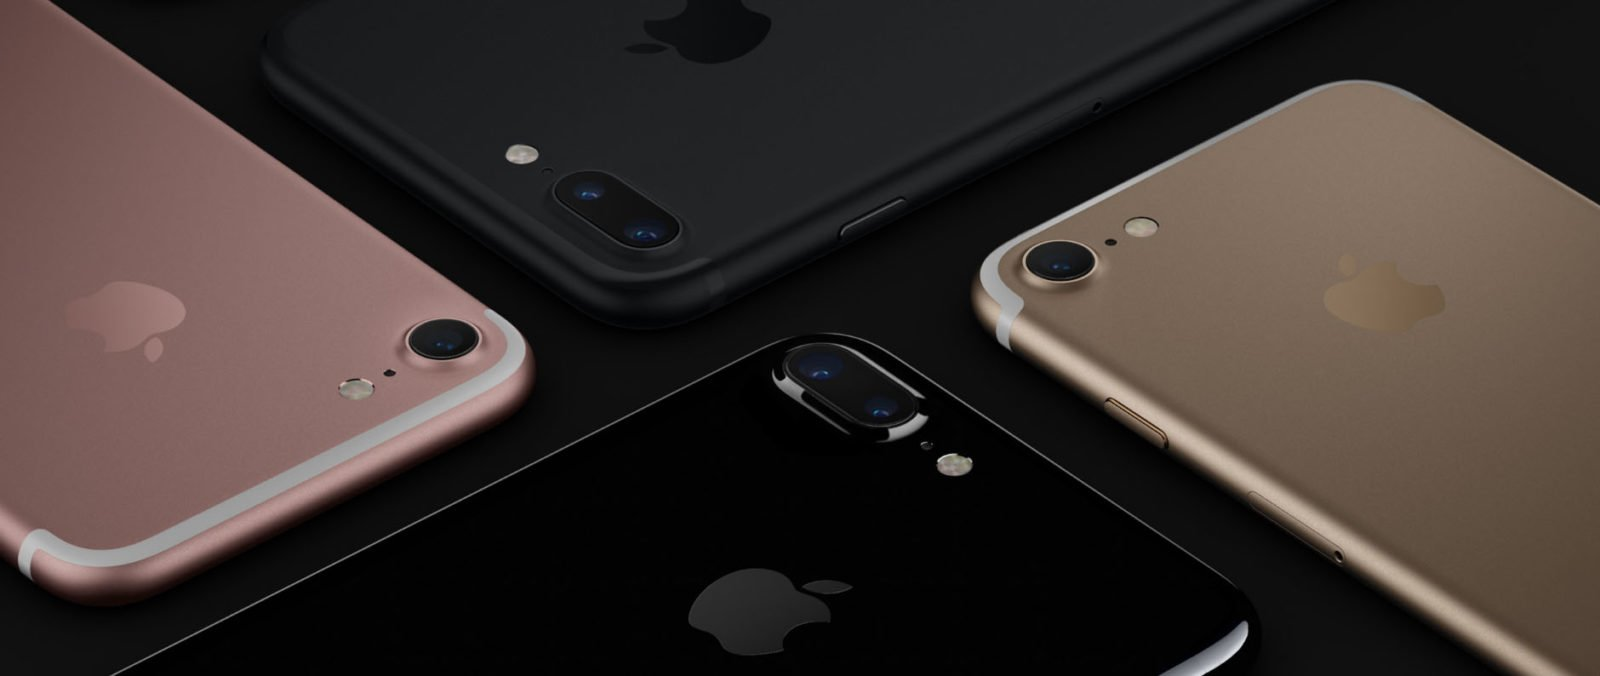 copertine iphone 7